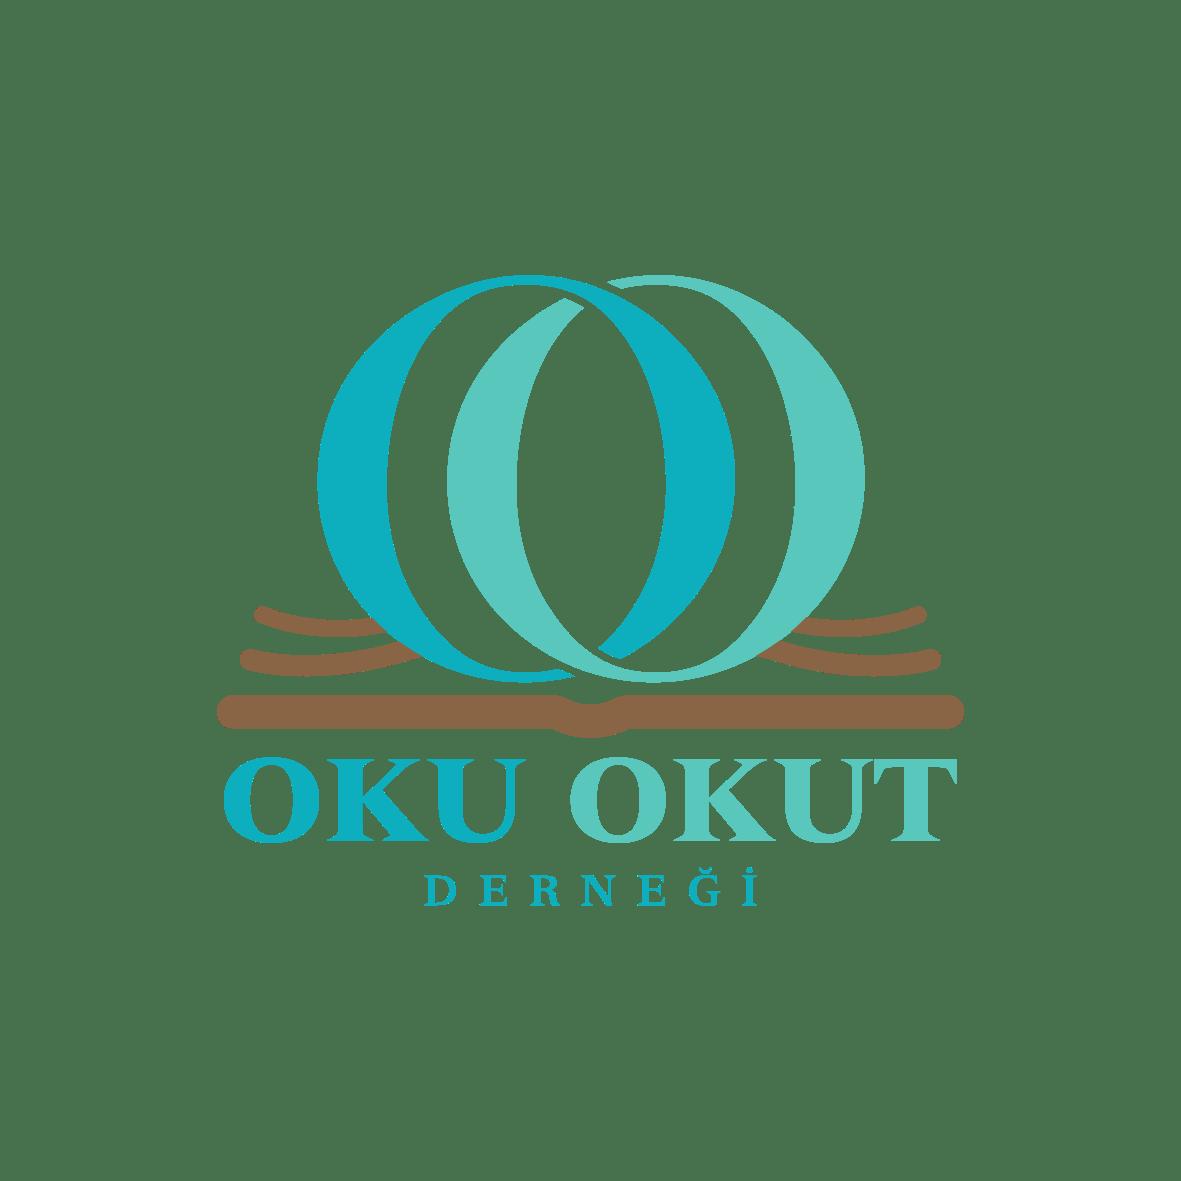 oku-okut-dernek-logo